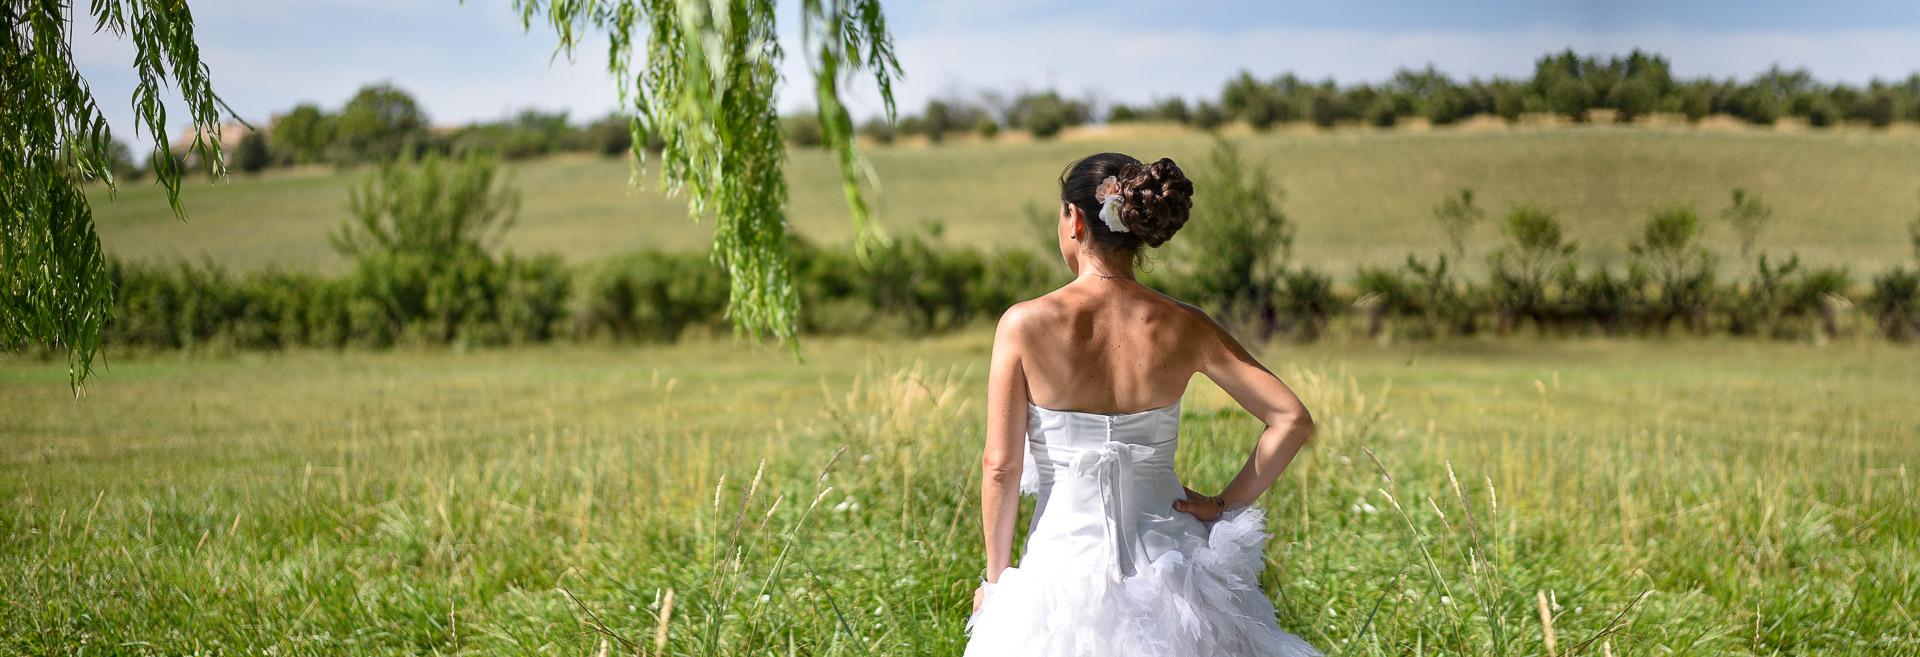 lieu mariage nature chic 04